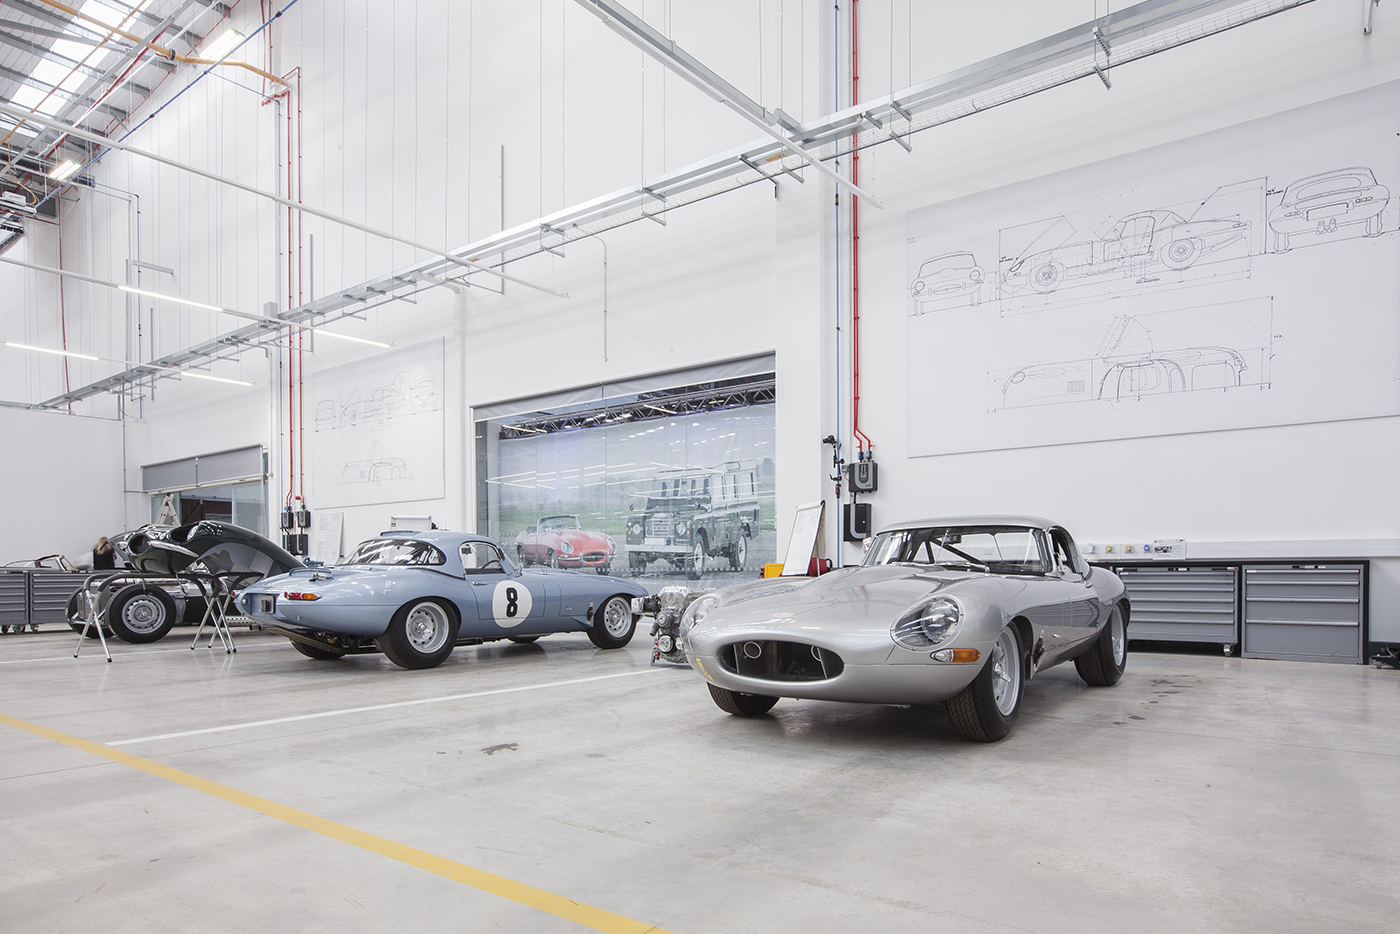 jaguar-land-rover-classic-works-9.jpg